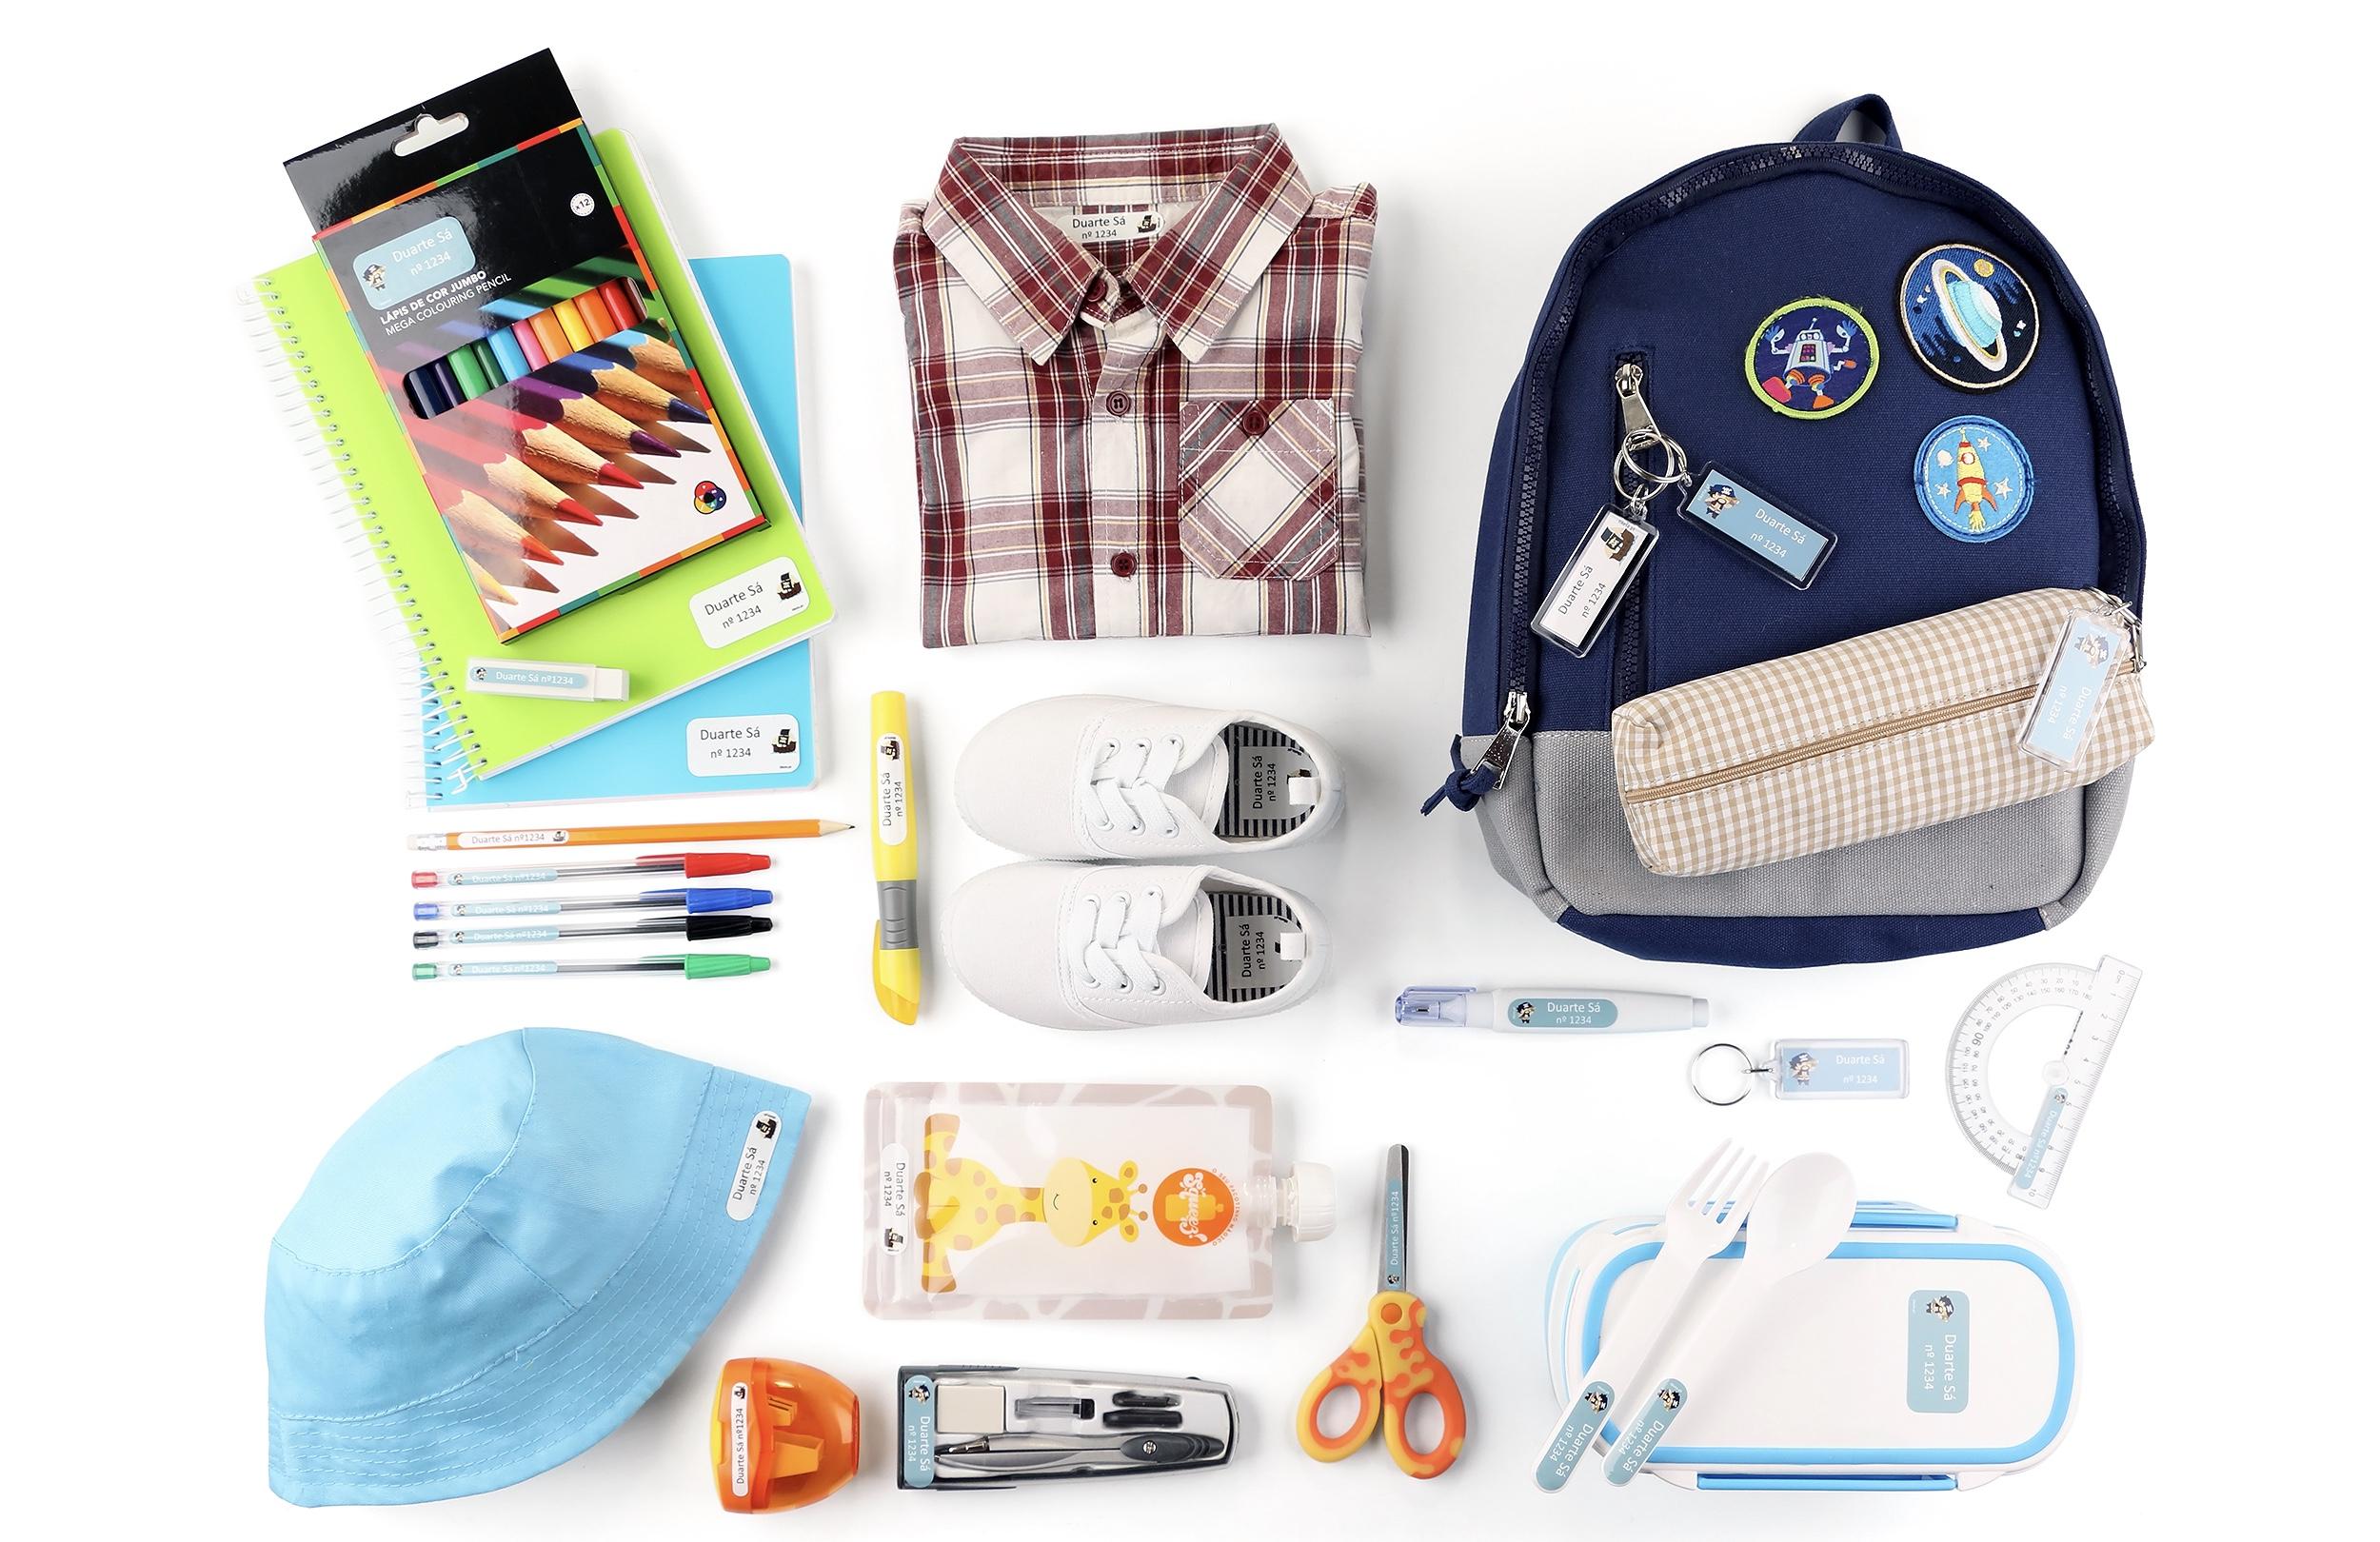 kits-poupanca-etiquetas-regresso-as-aulas